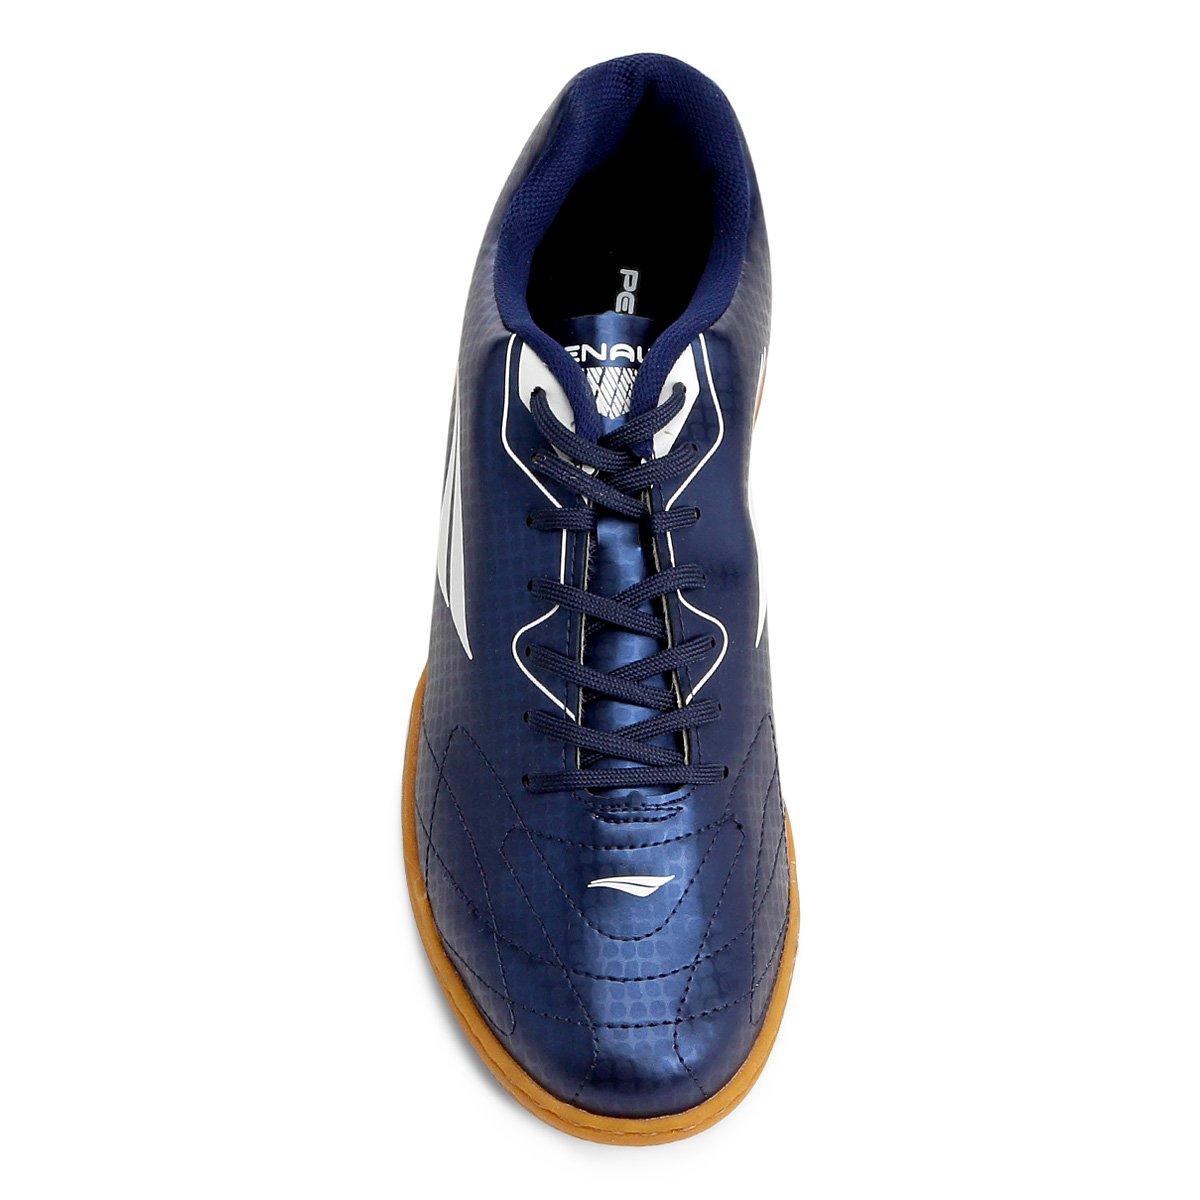 67fea6b4a4 Chuteira Futsal Penalty Matis VIII Masculina - Azul e Branco ...